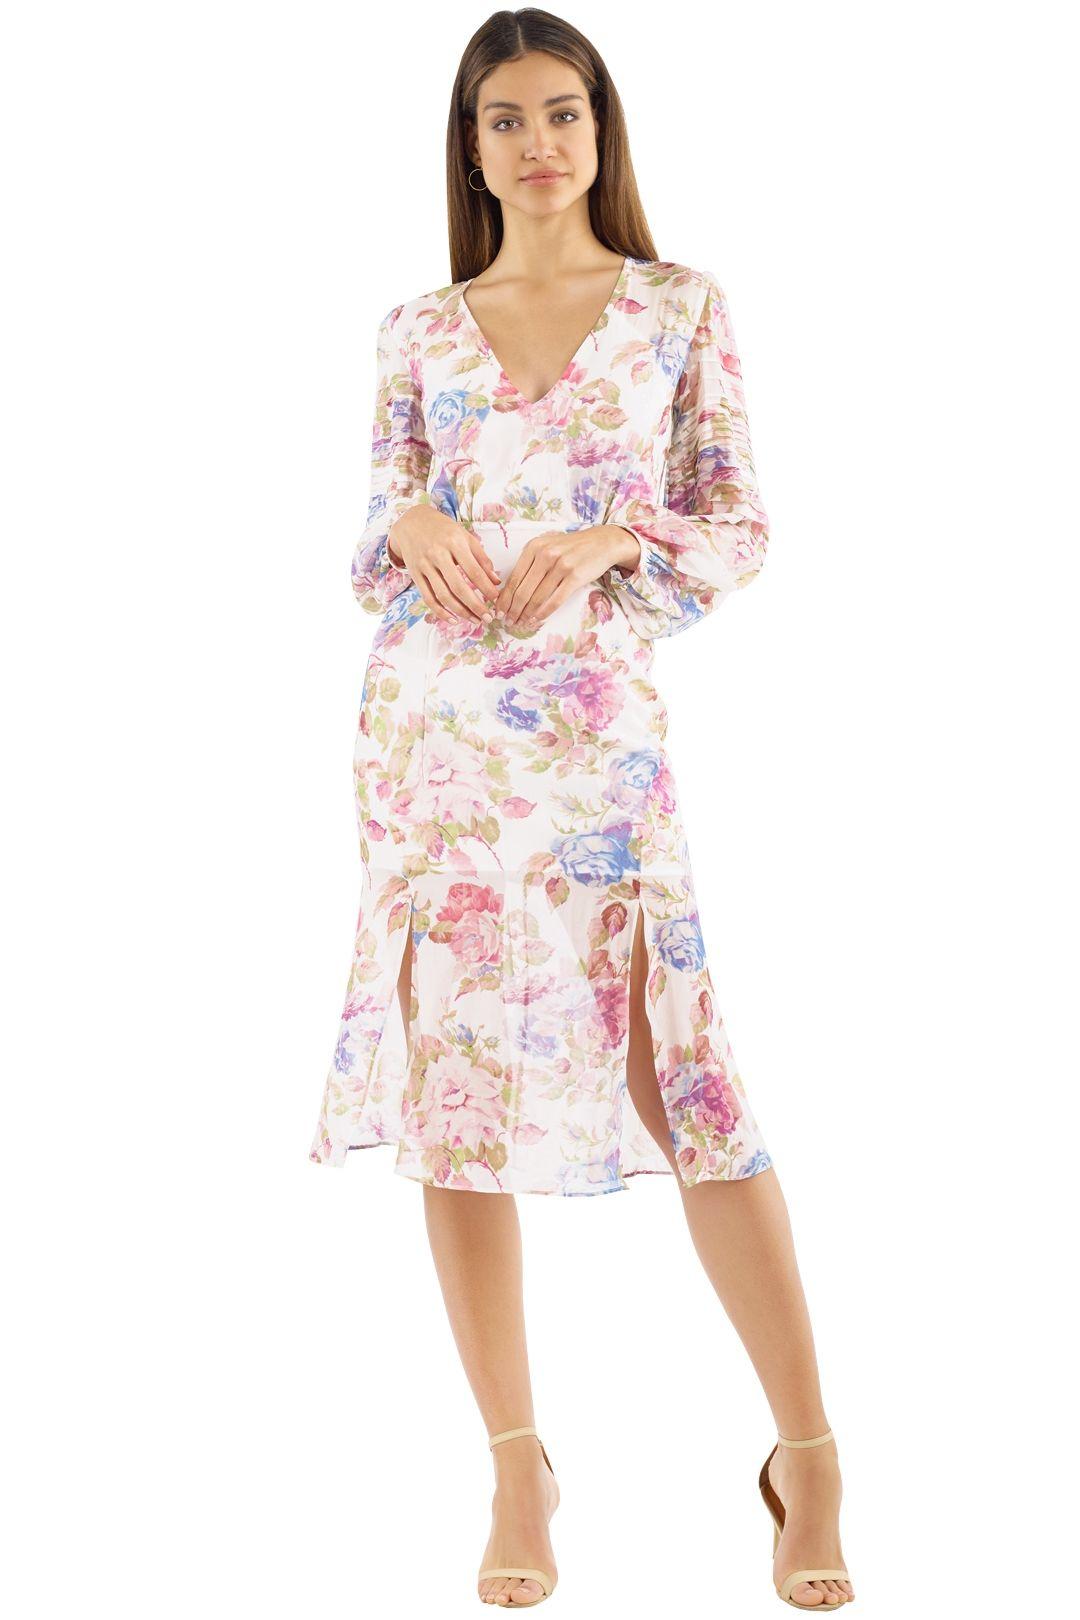 Talulah - Epiphany Midi Dress - Pink Multi - Front